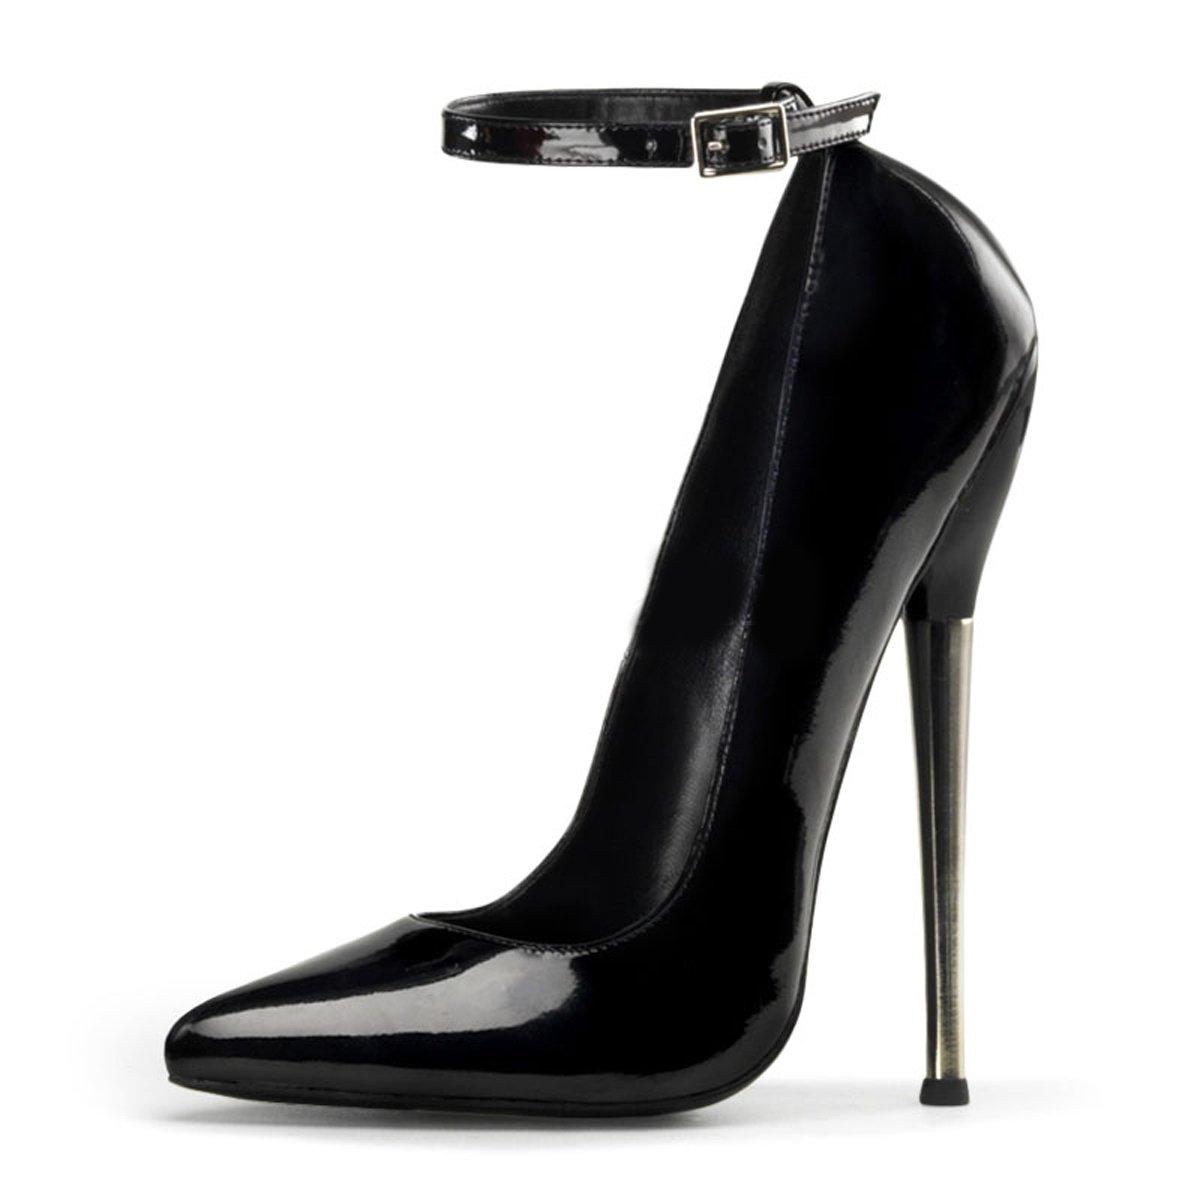 Devious High Heels Heels Heels Pumps Dagger-12 Lack Schwarz ae6e38